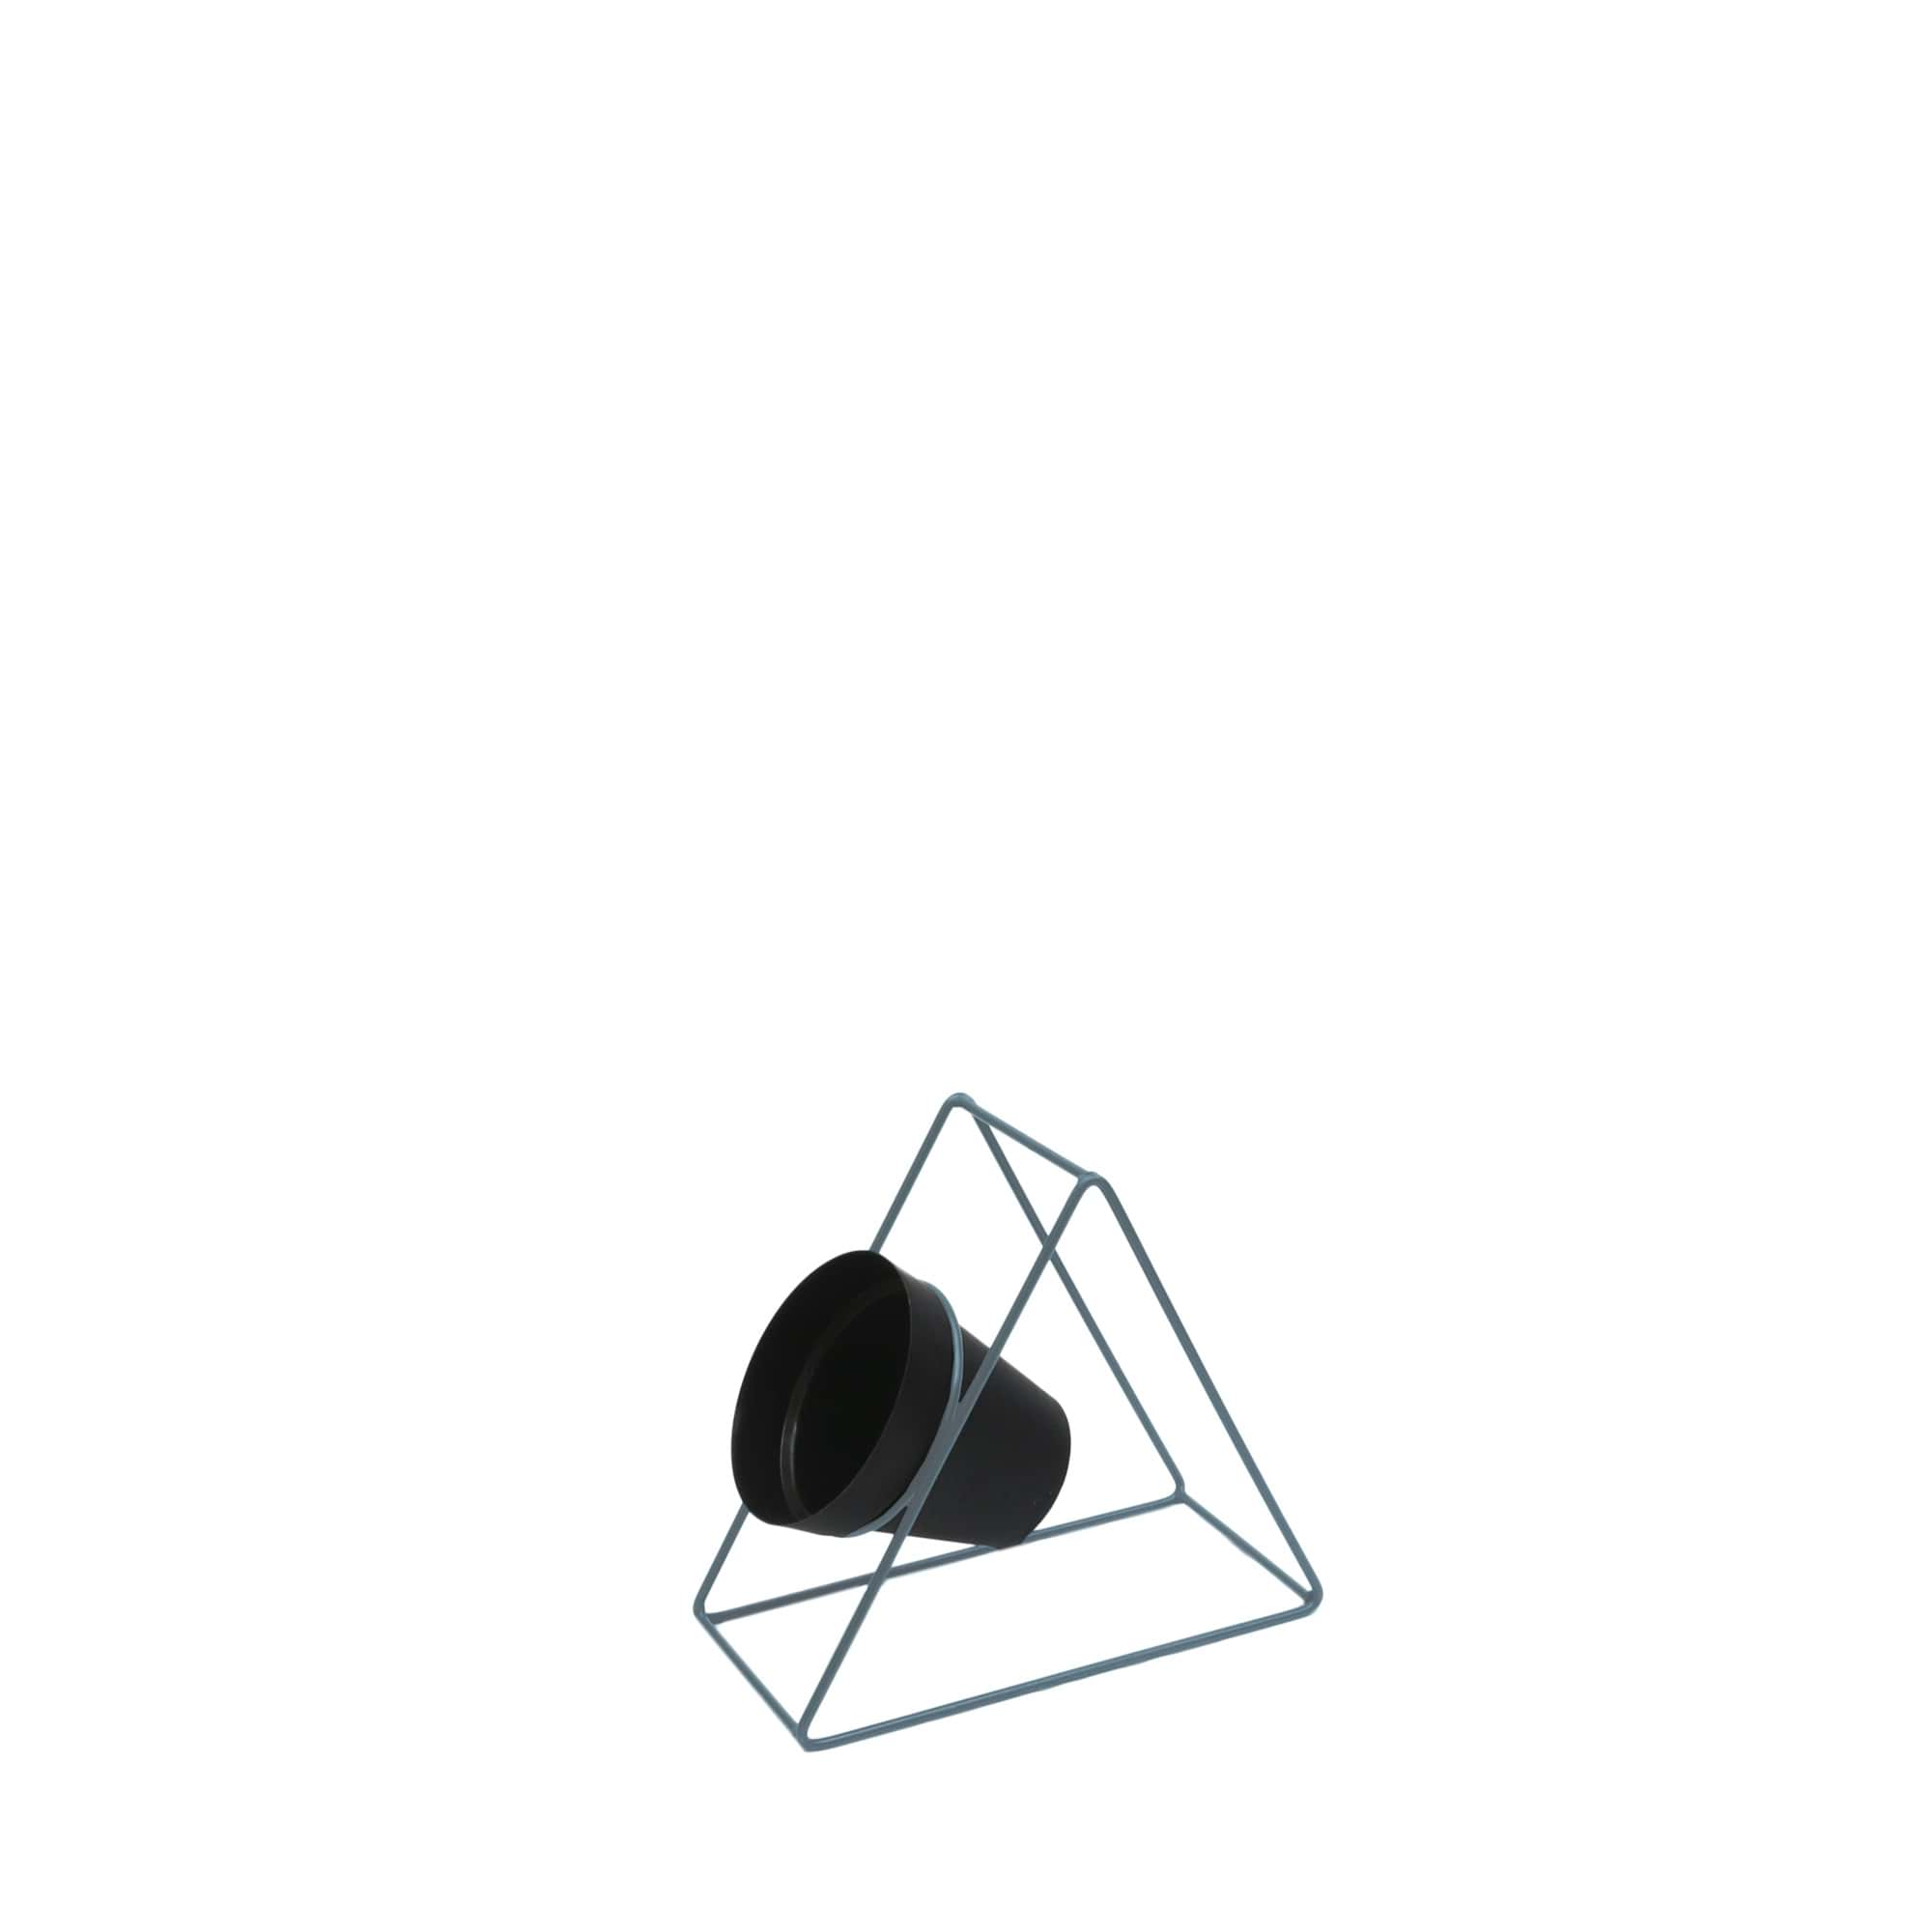 Suporte Ferro Triângulo Parede 24 x 24 cm Azul Vasart